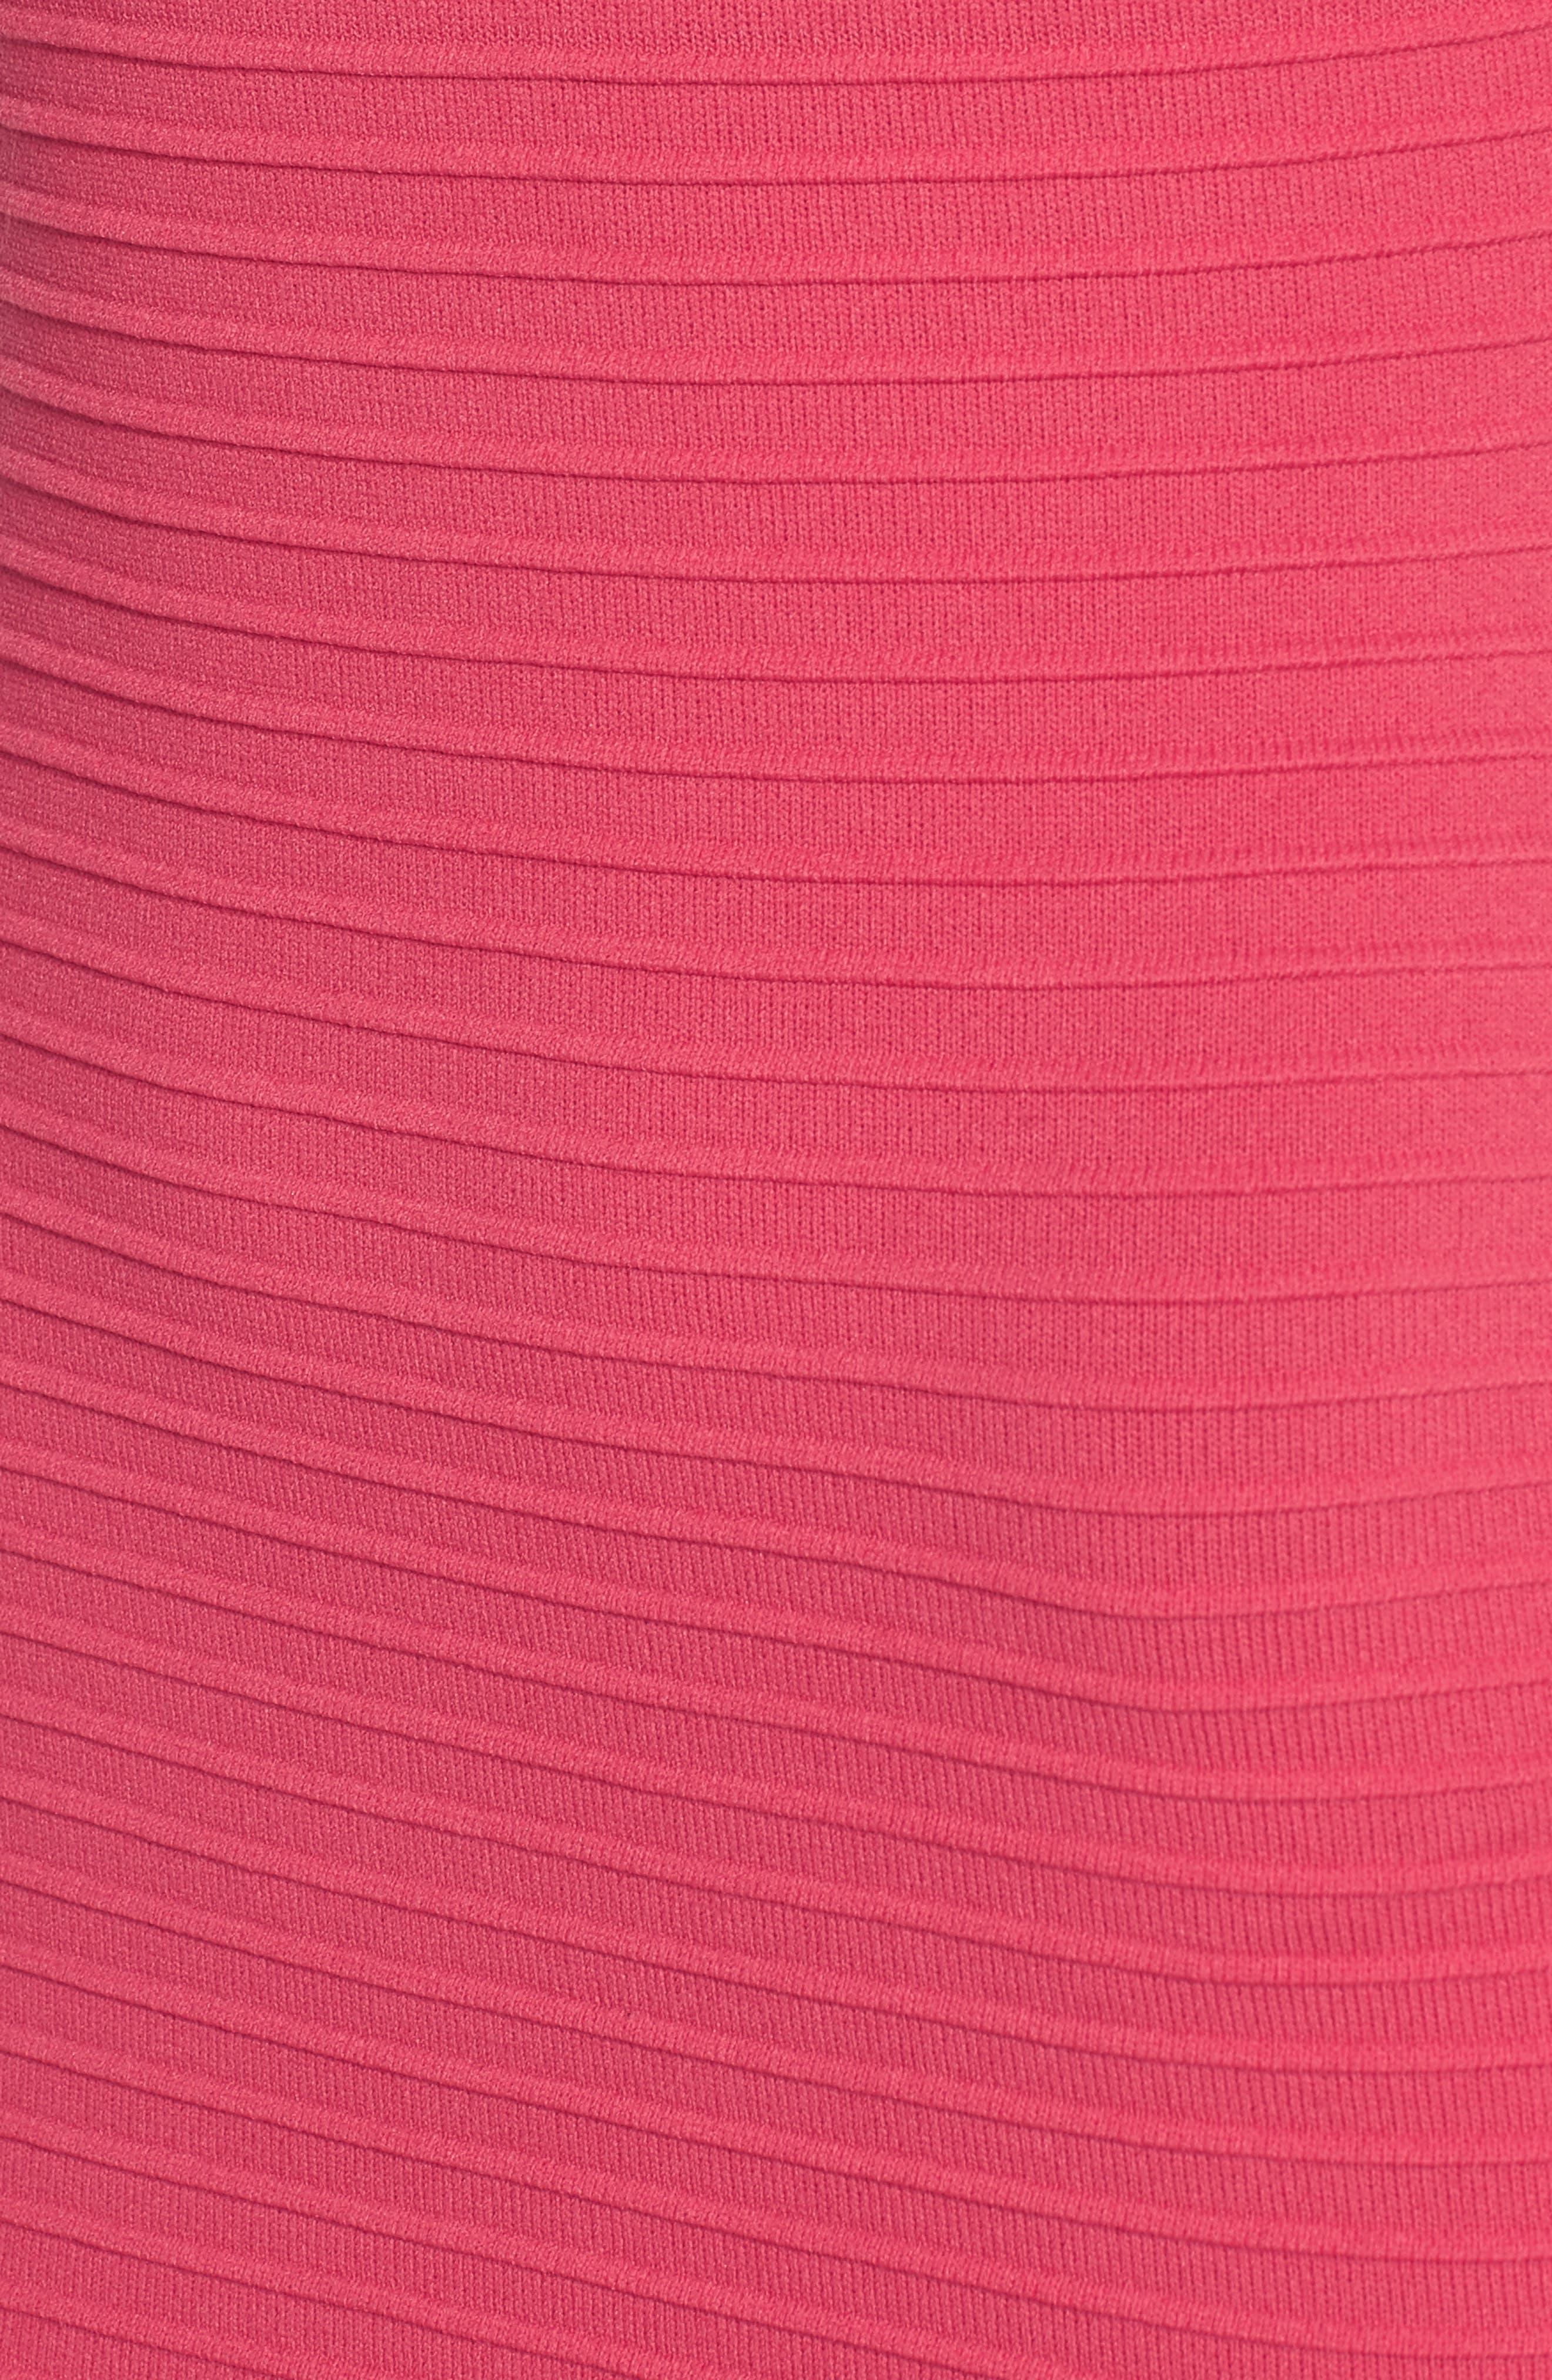 Open Weave Body-Con Dress,                             Alternate thumbnail 6, color,                             650